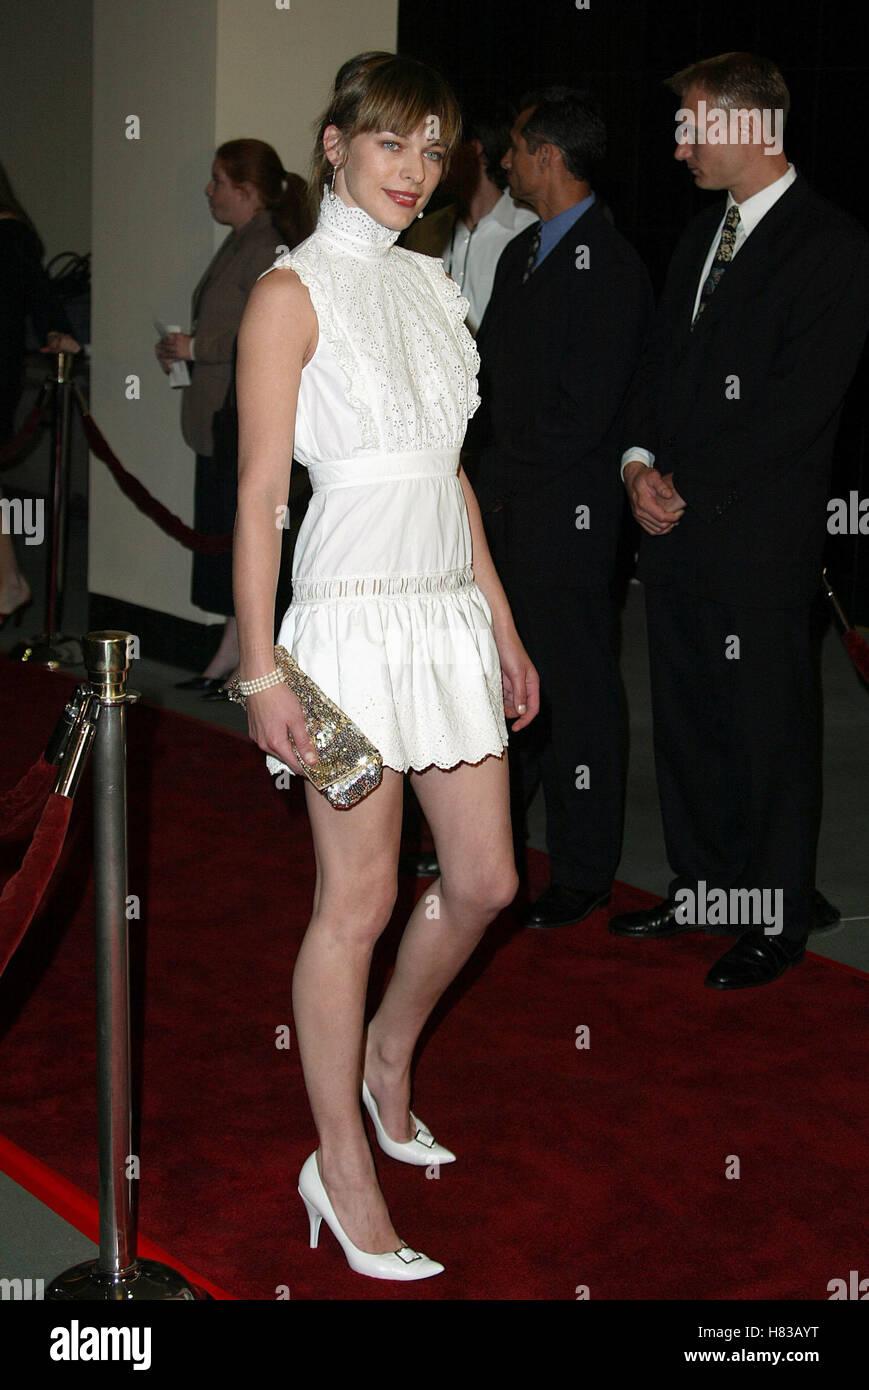 Milla Jovovich Resident Evil Film Premiere Hollywood Los Angeles